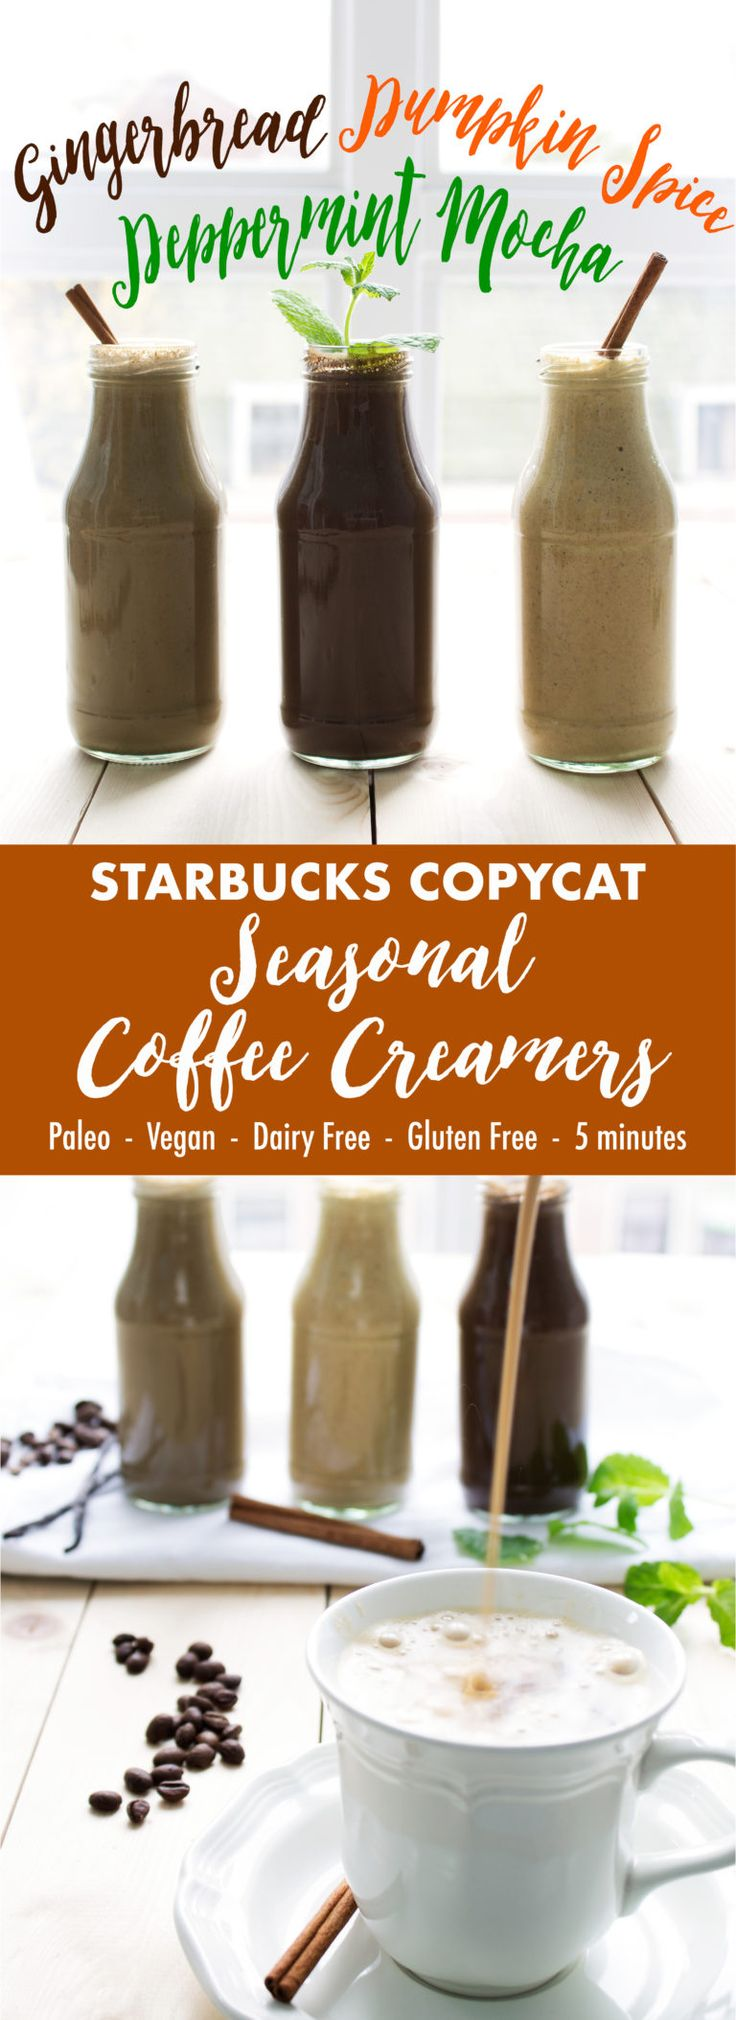 Starbucks Copycat Seasonal Coffee Creamers